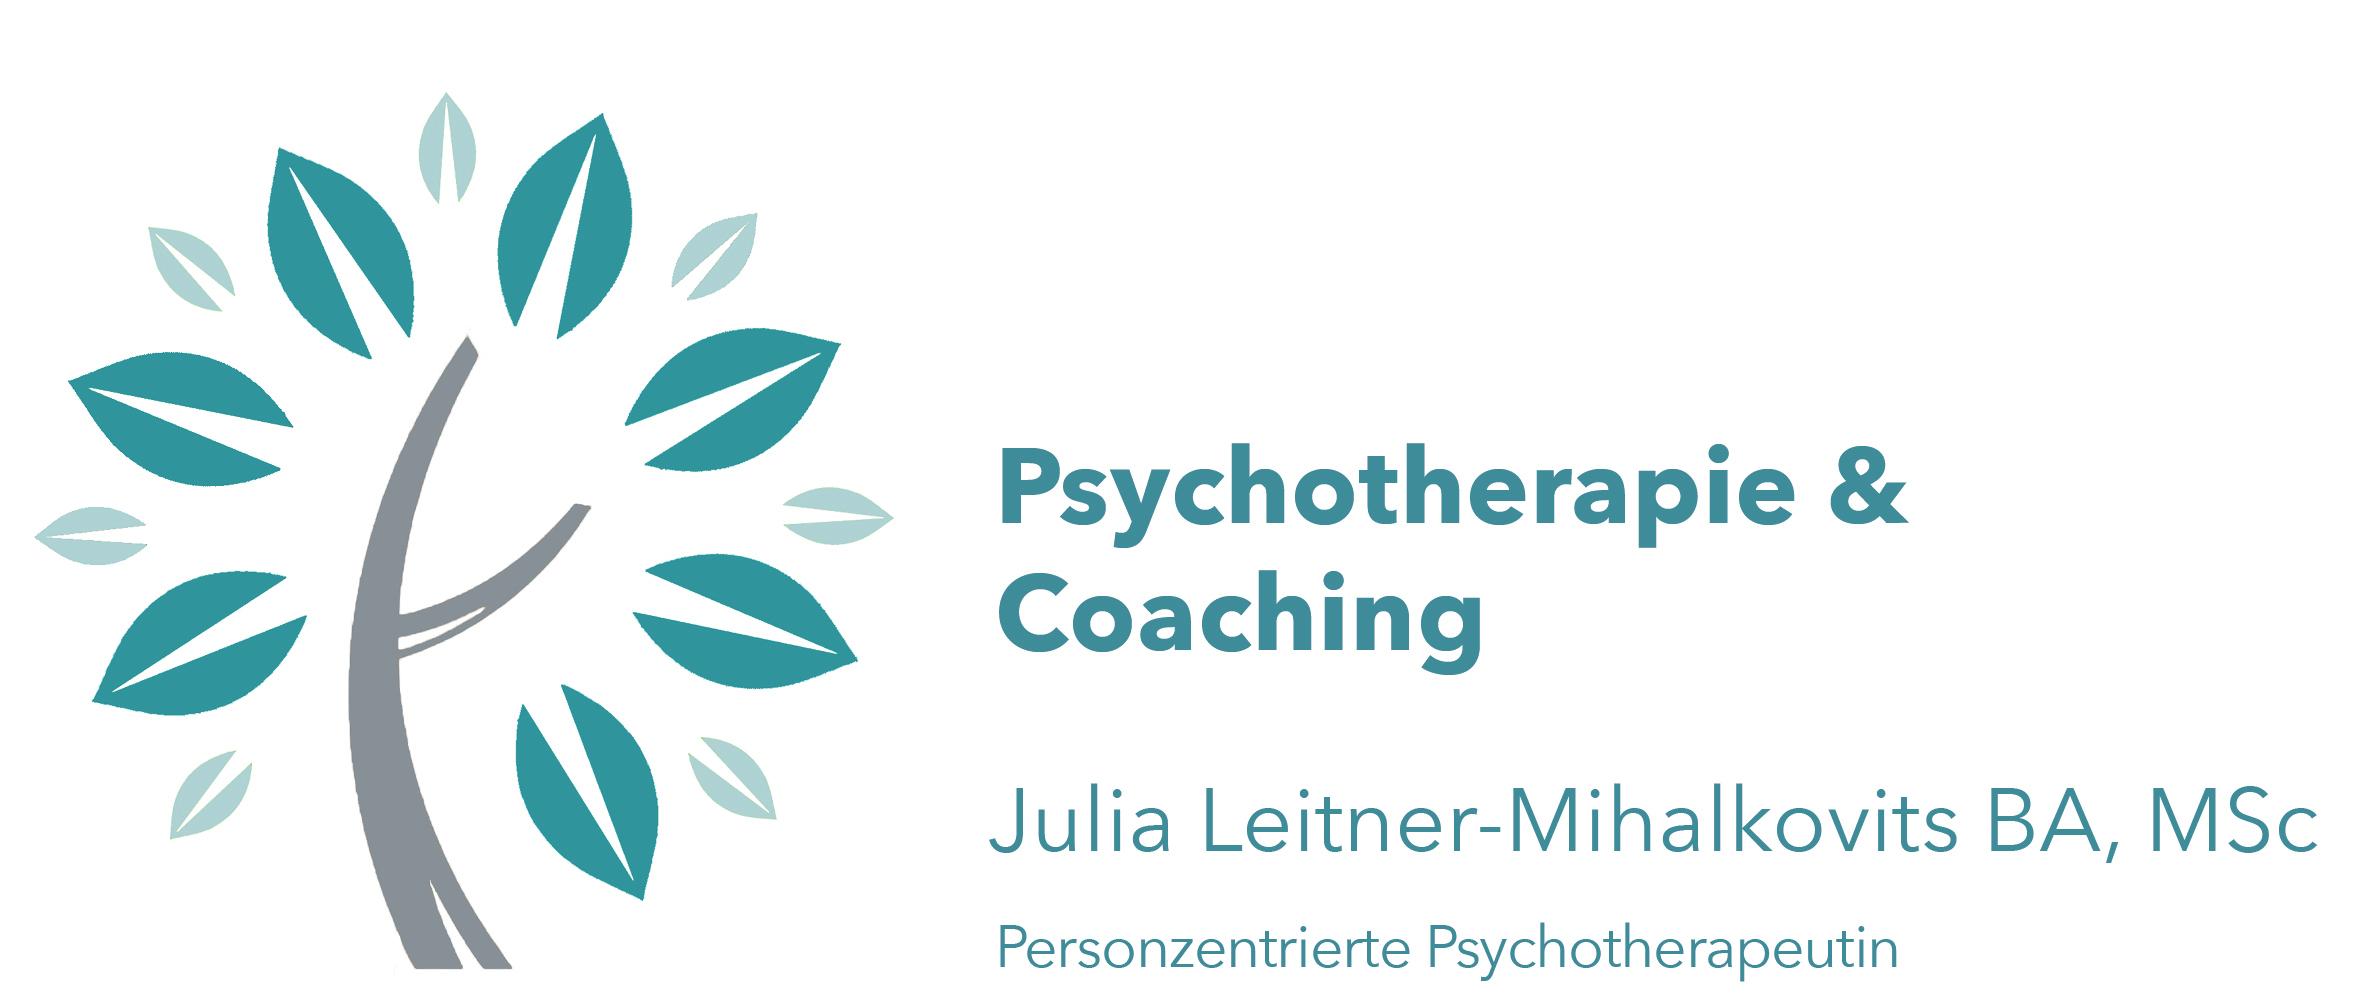 Psychotherapeutische Praxis Julia Leitner-Mihalkovits